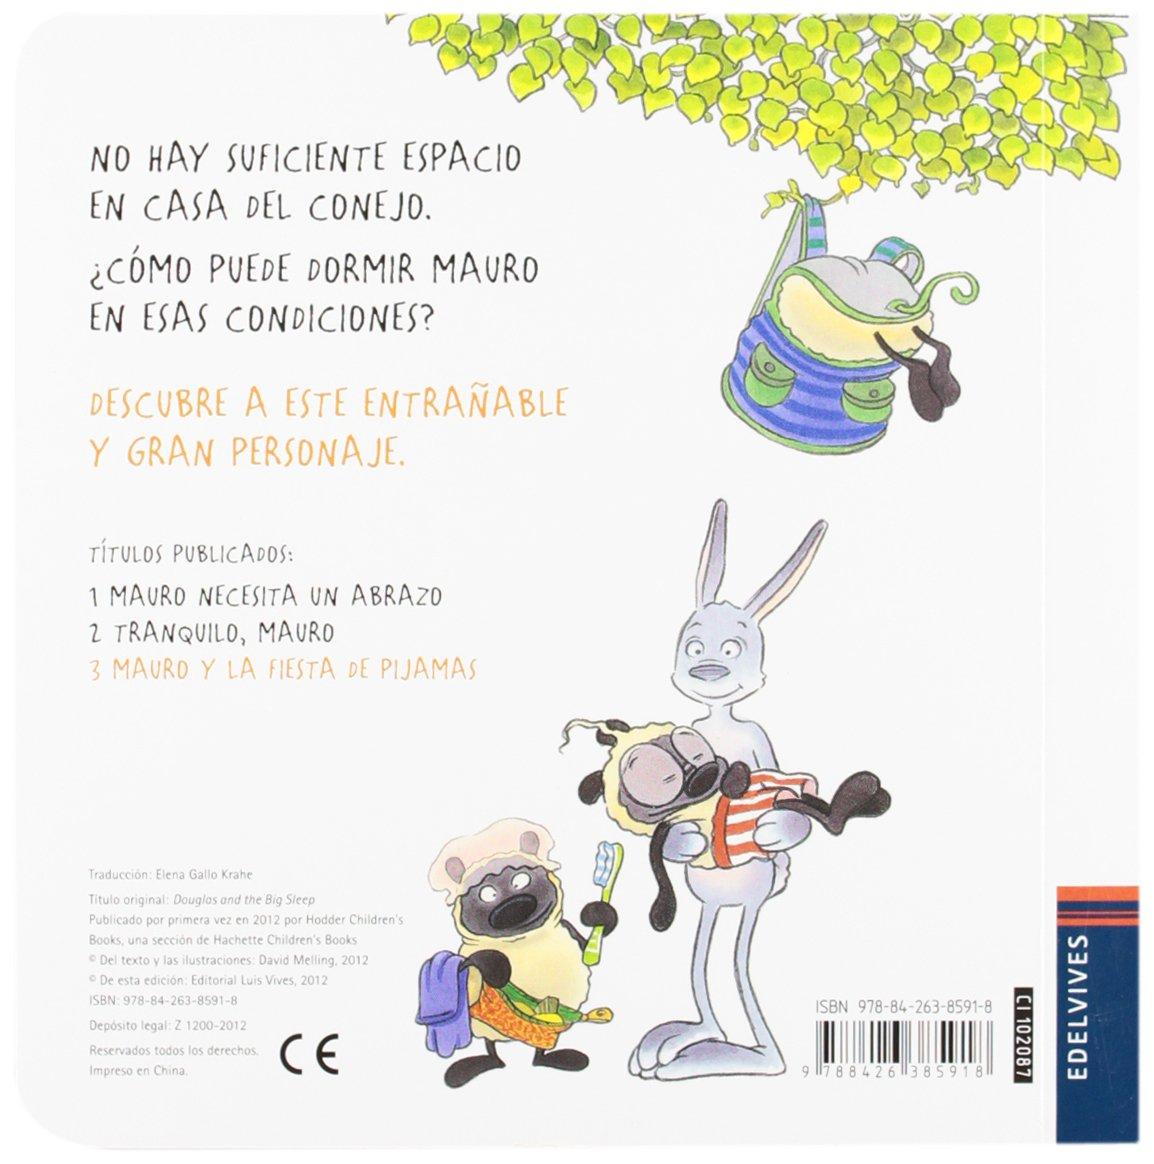 Mauro y la fiesta de pijamas / Douglas and the Big Sleep (Spanish Edition): David Melling: 9788426385918: Amazon.com: Books